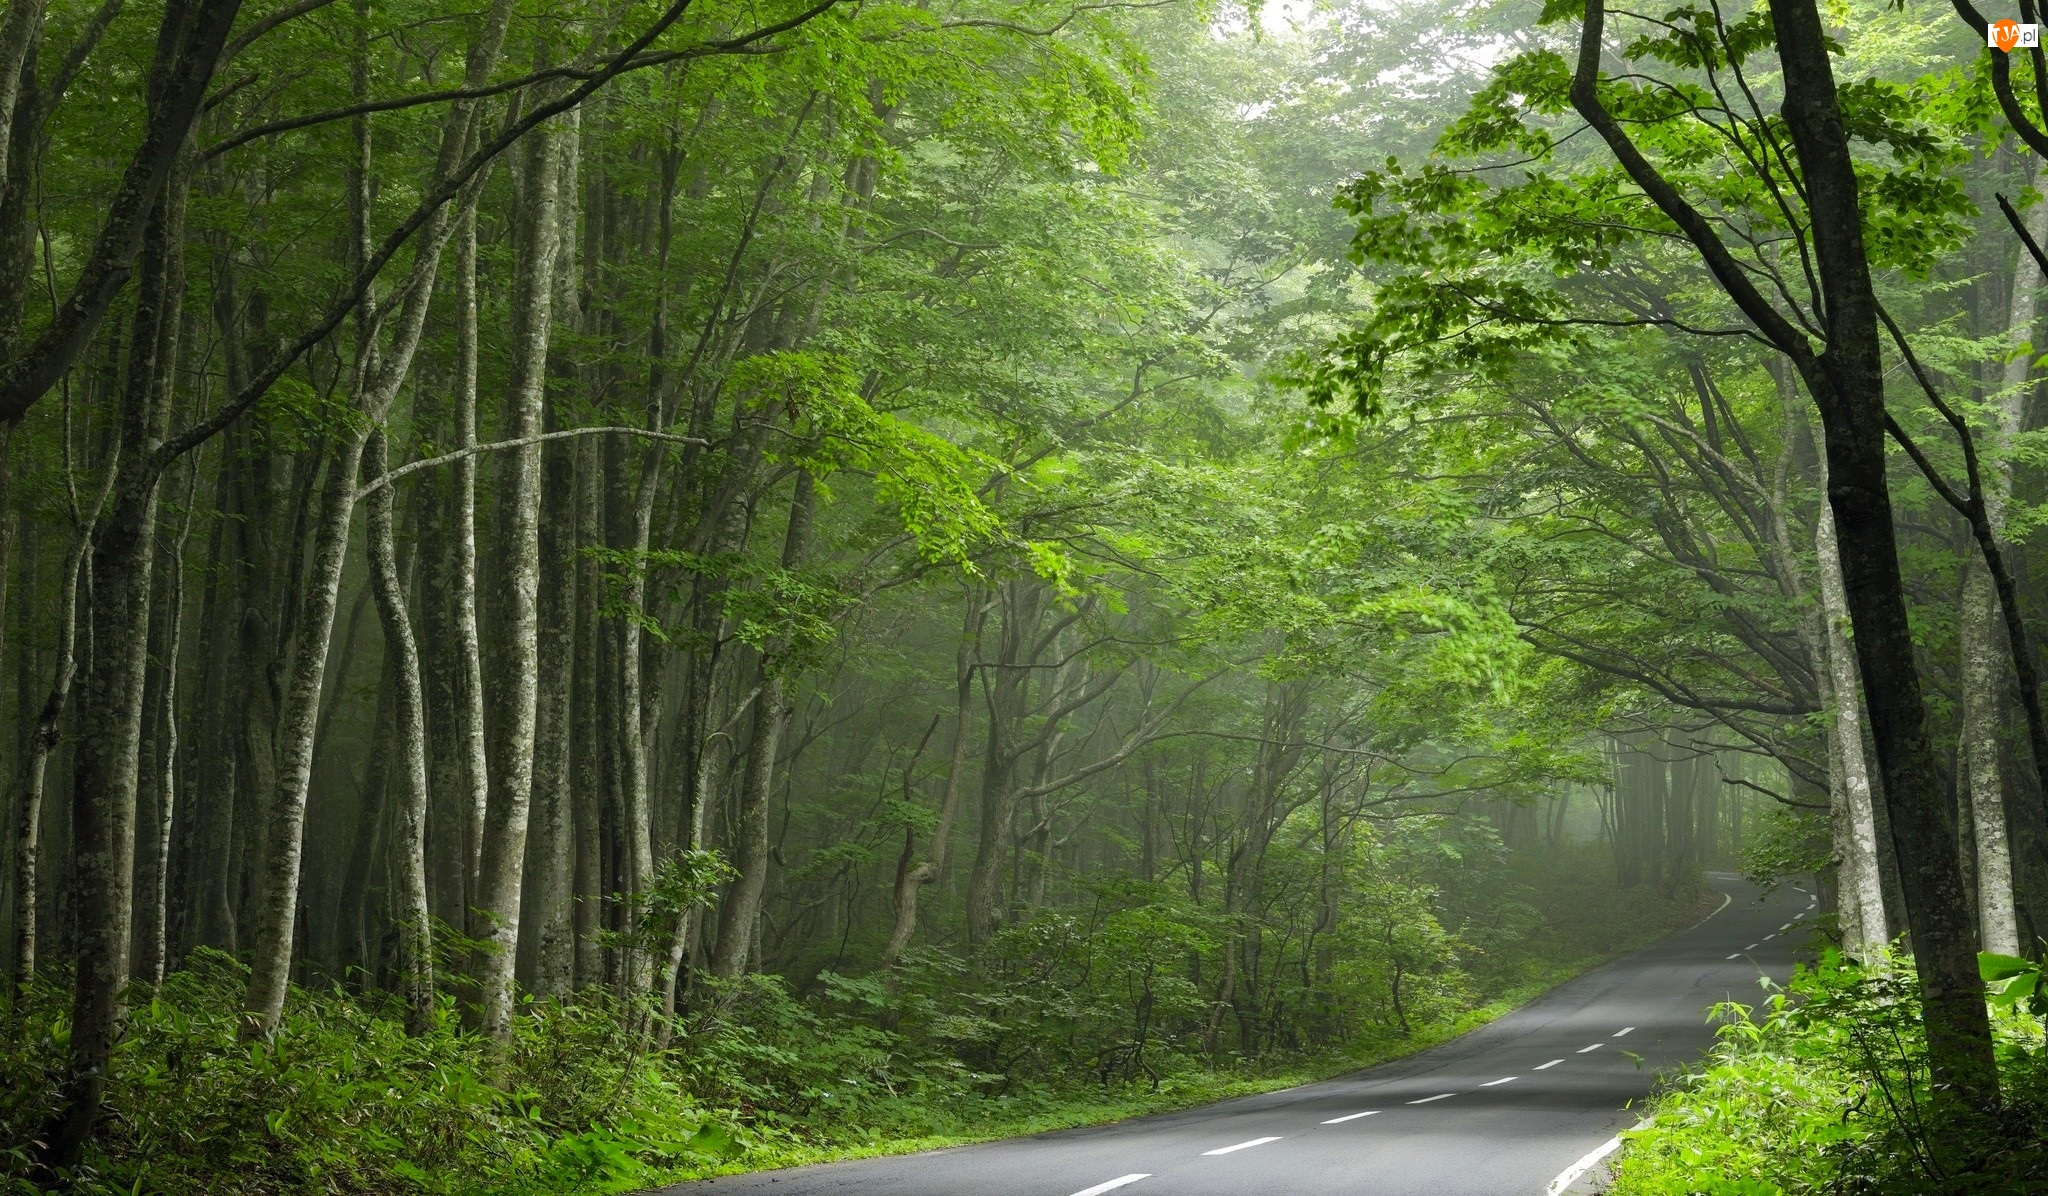 Droga, Drzewa, Asfaltowa, Las